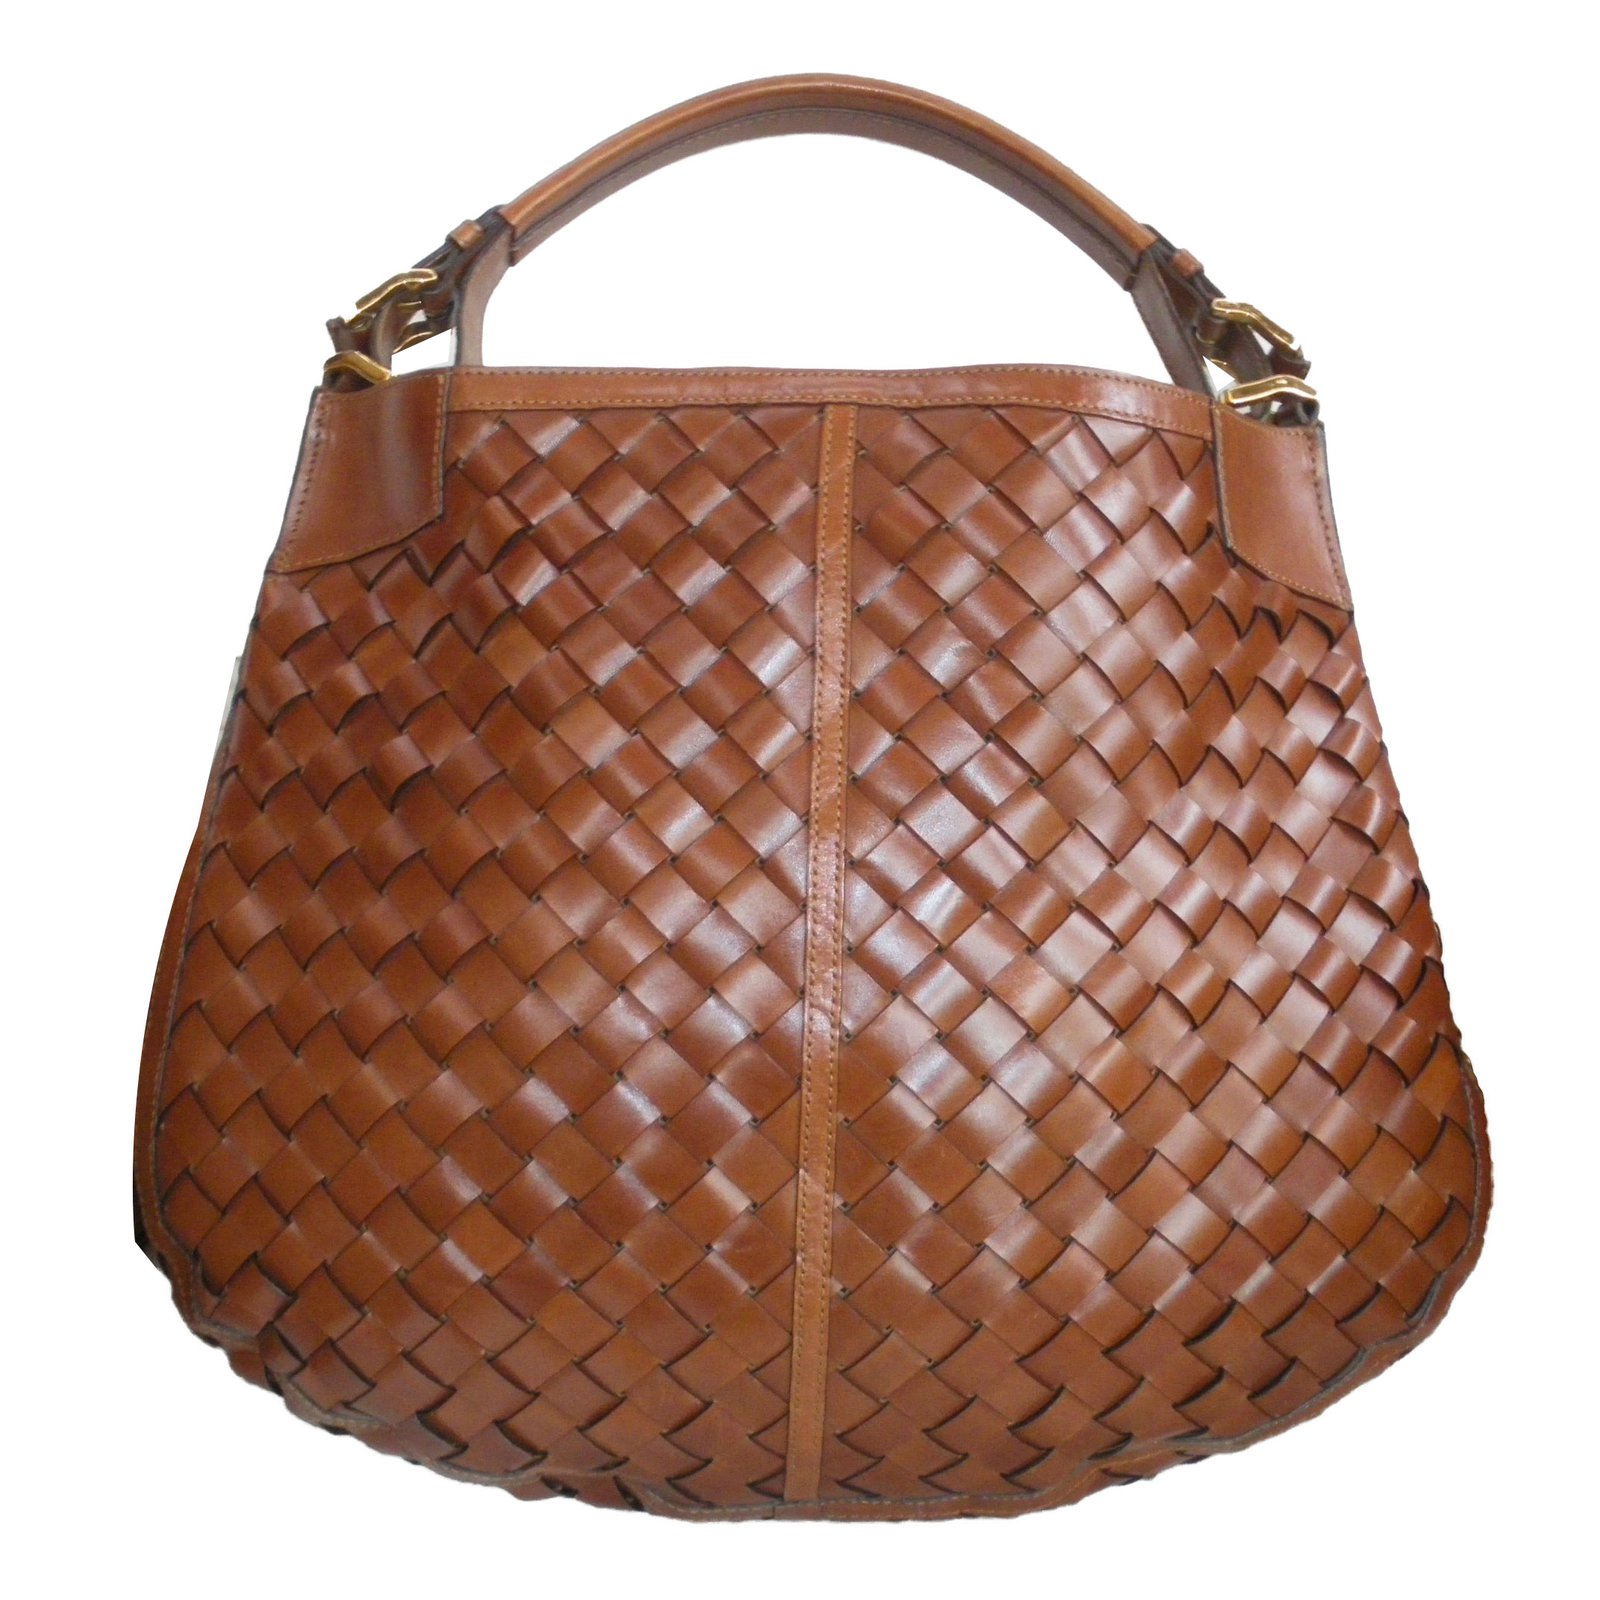 Burberry Handbags Handbags Leather Brown ref.64275 - Joli Closet 2f72cb6efd